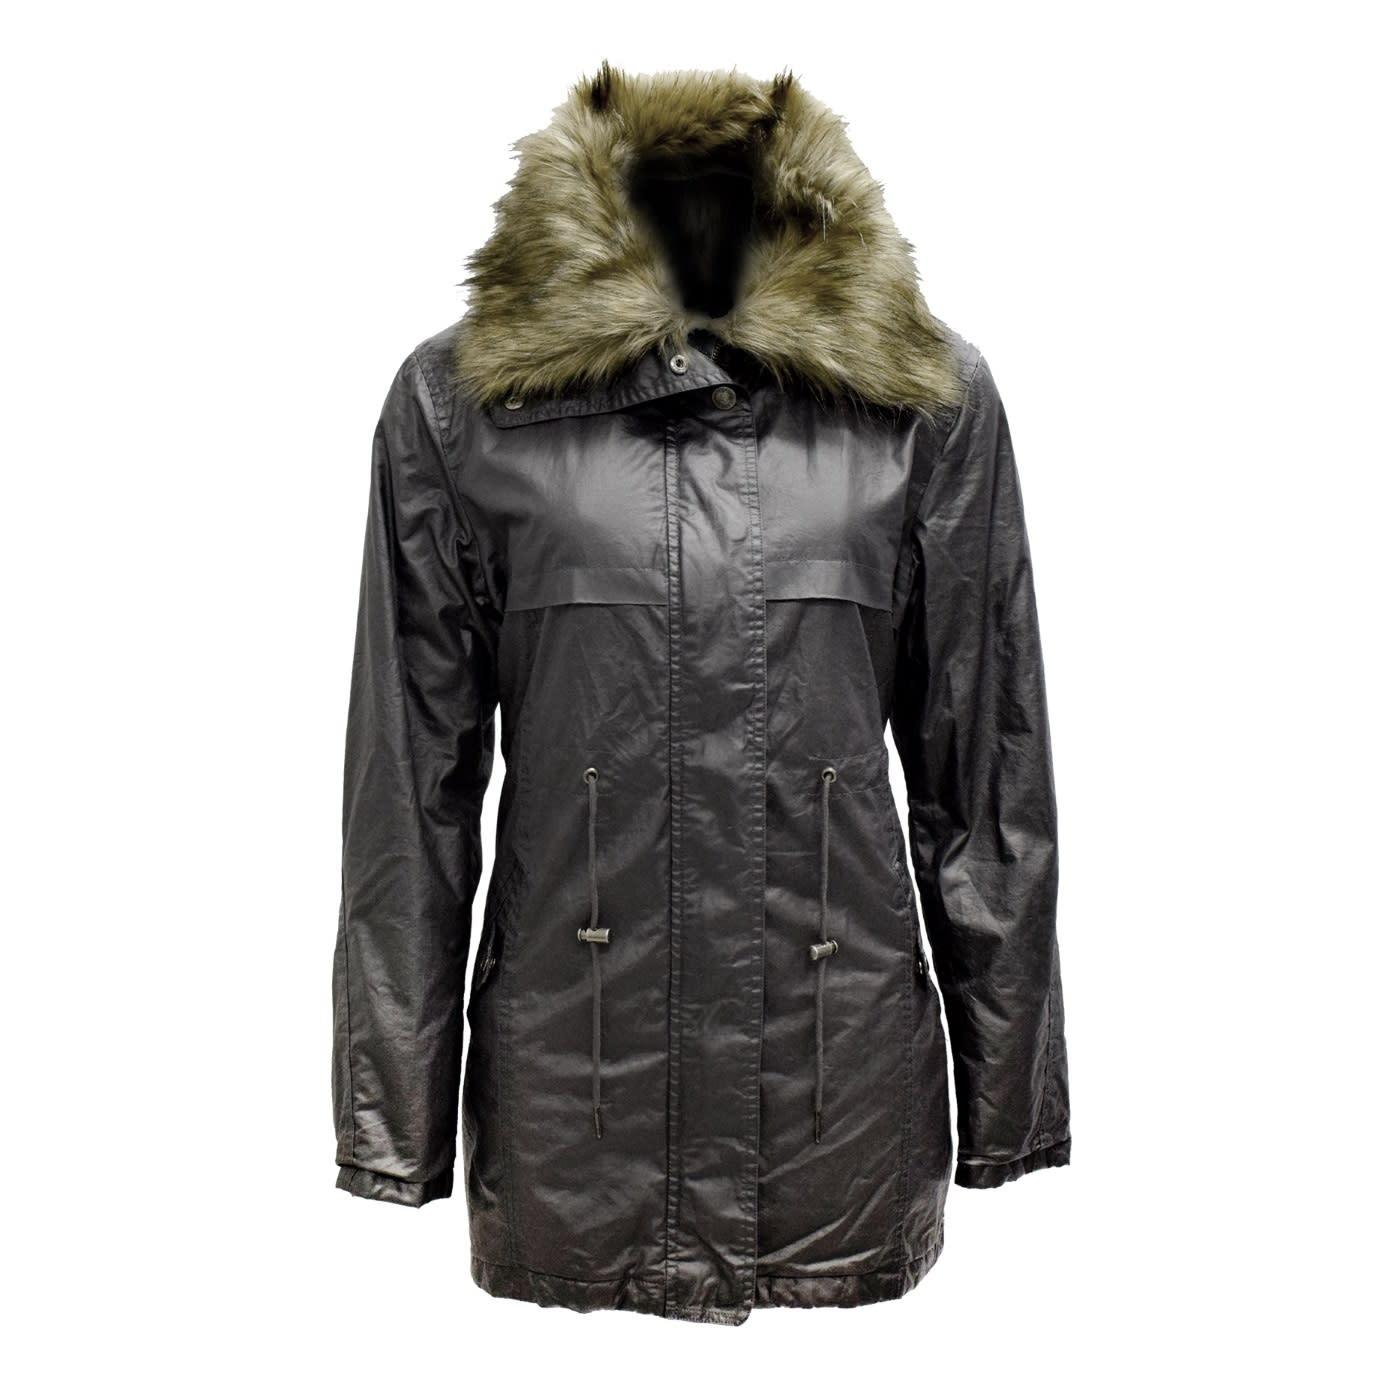 Jeep Ladies Cotton Fur Jacket